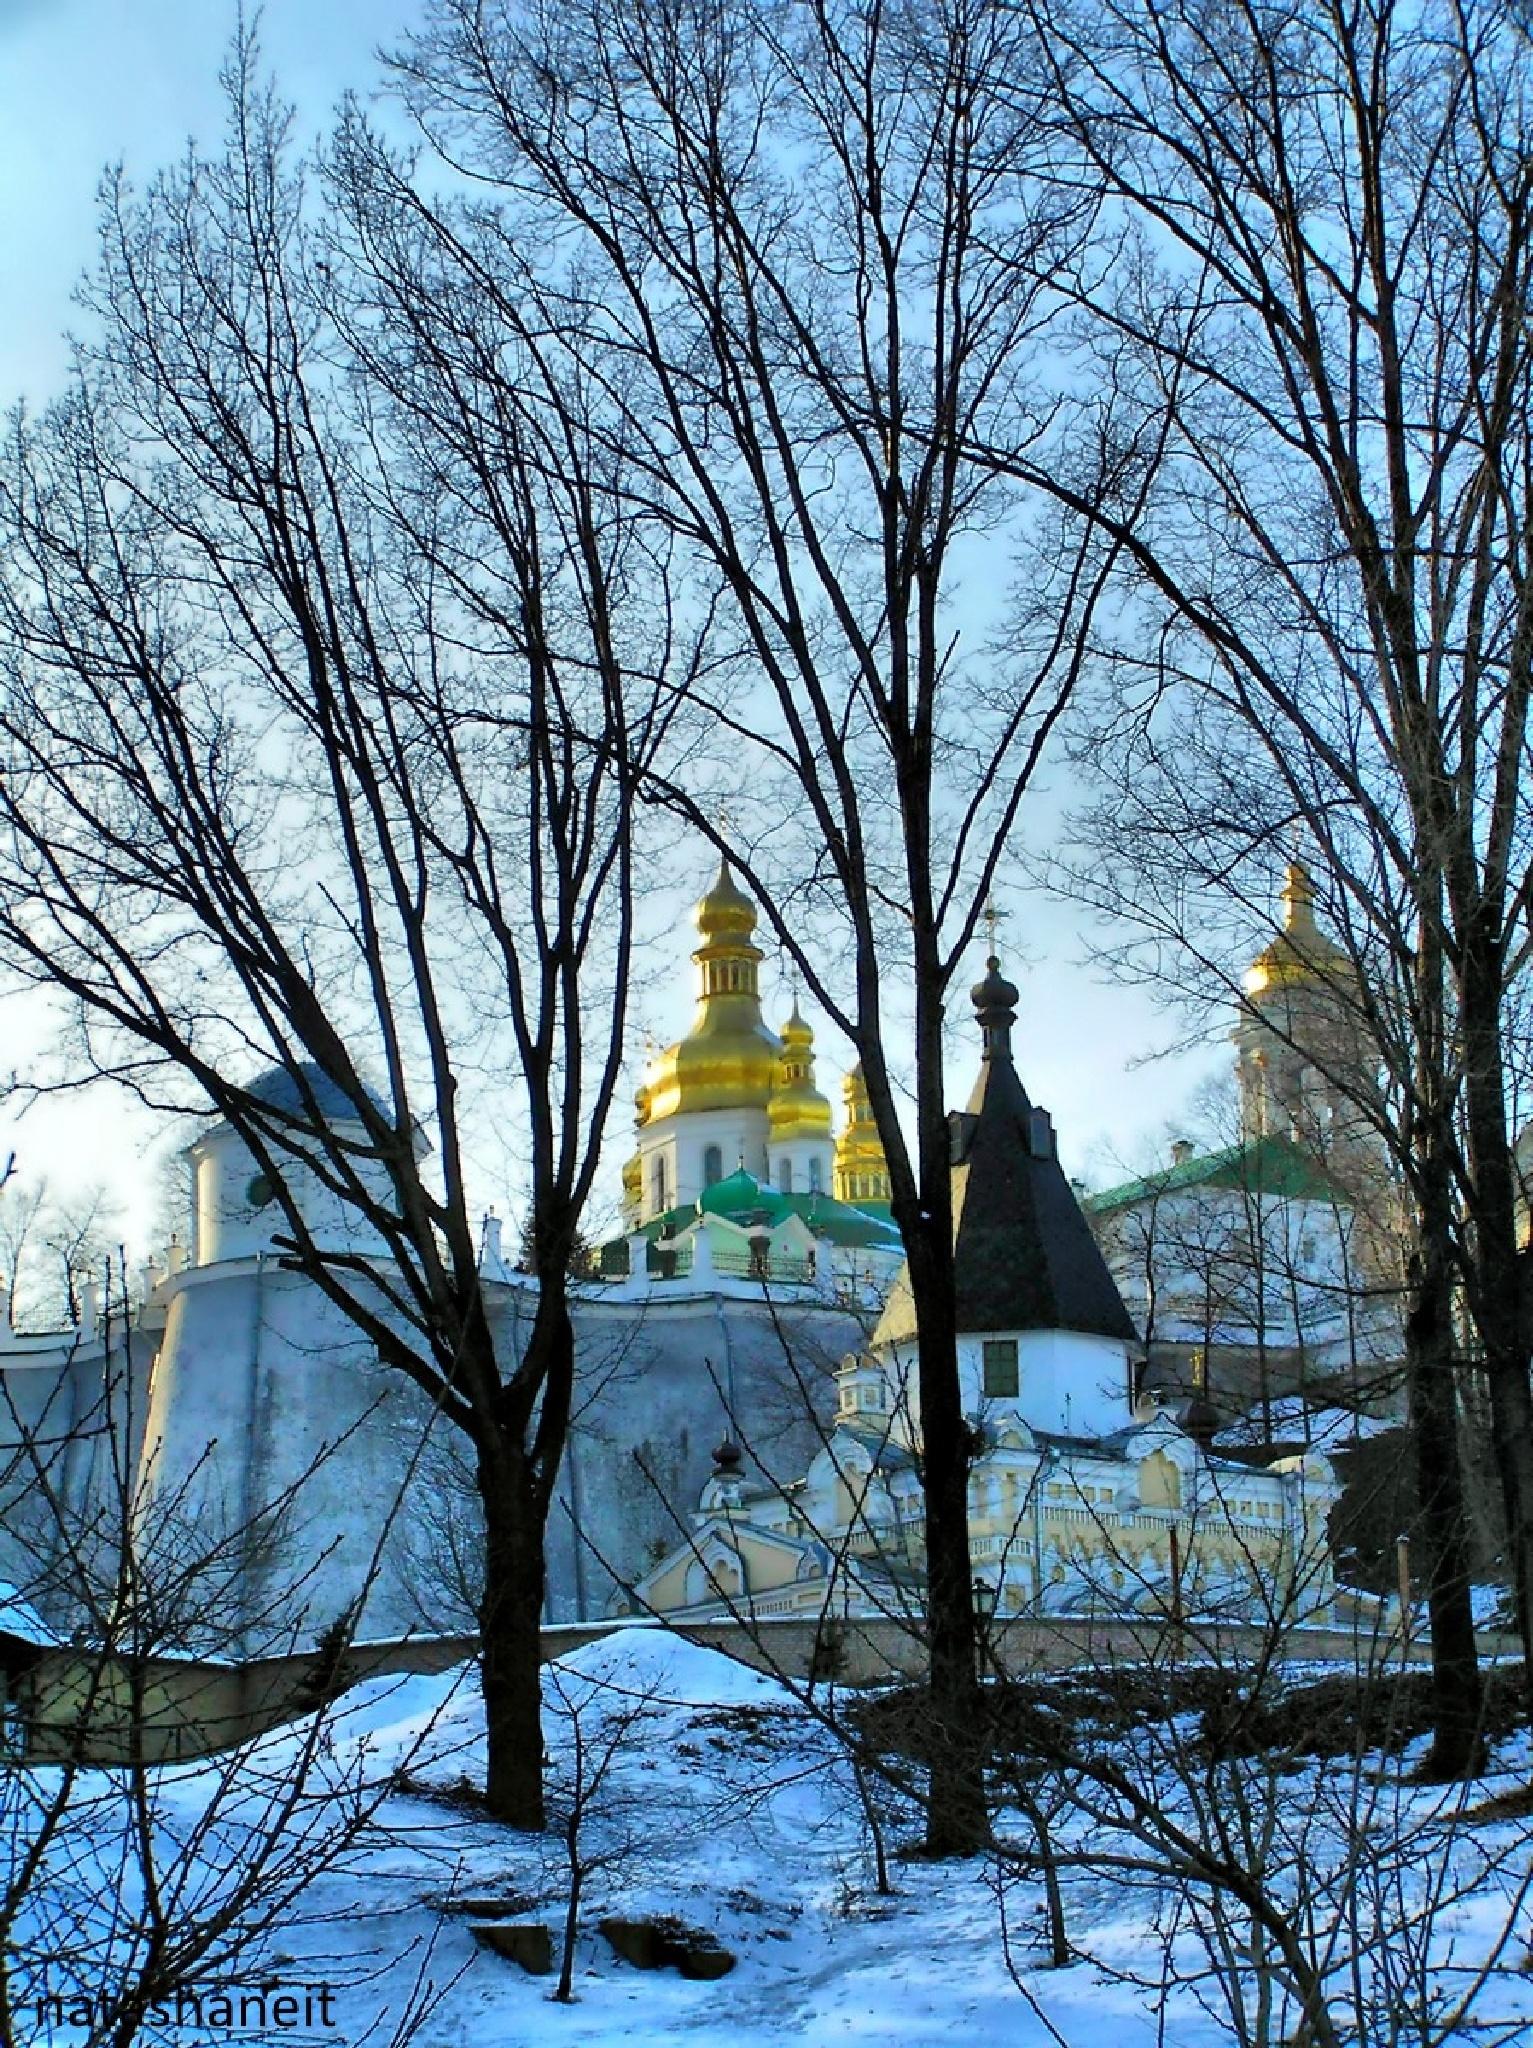 Monastery in the winter by natashaneit